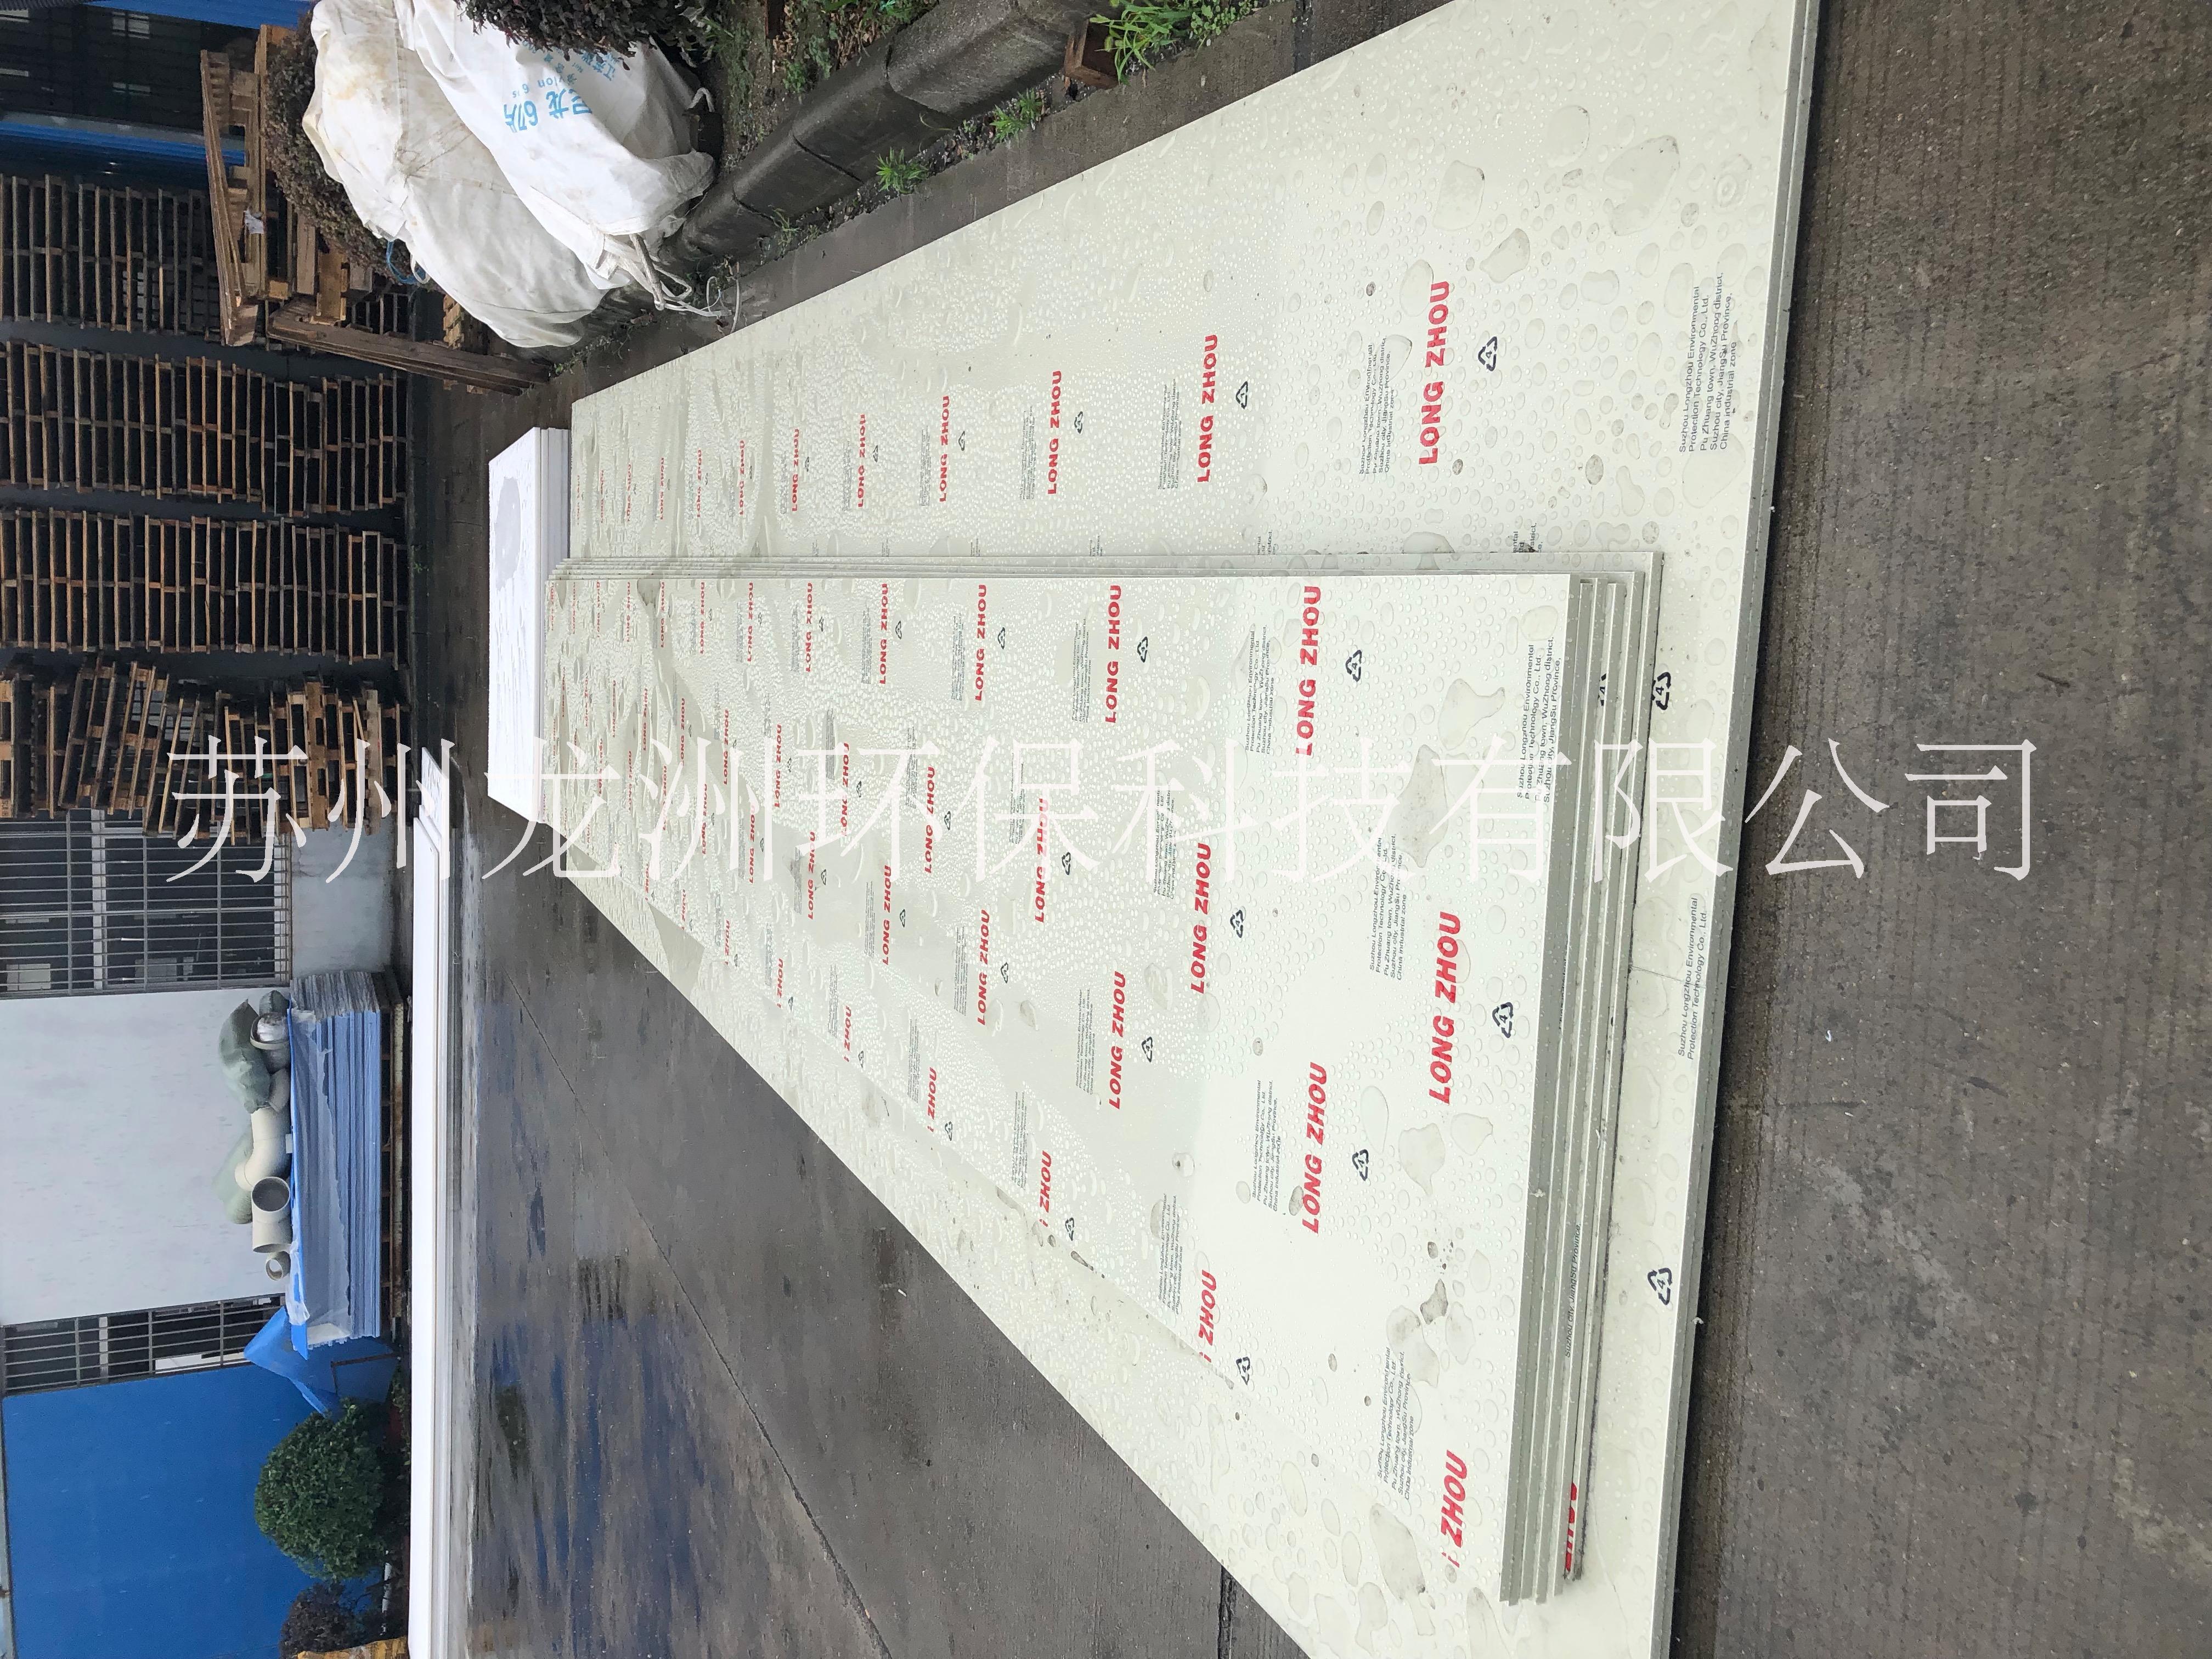 PP塑料板加工定制 PP塑料板厂家报价 昆山pp板材加工 欢迎电联